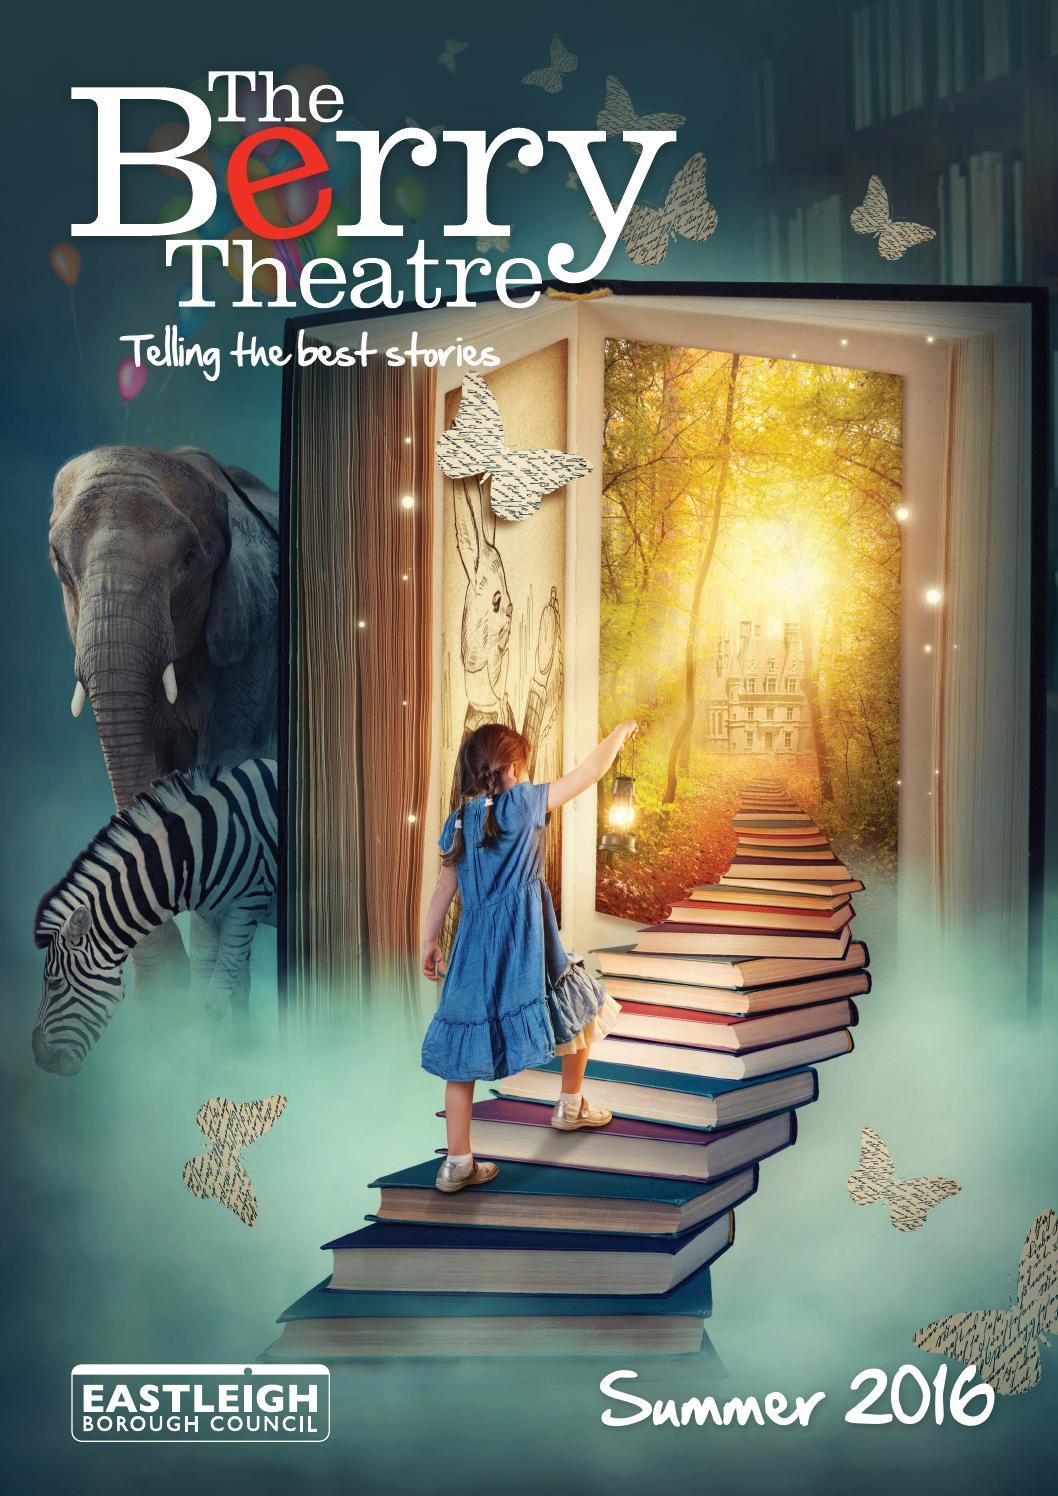 Summer 2017 Season Brochure by Cambridge Arts Theatre - Issuu